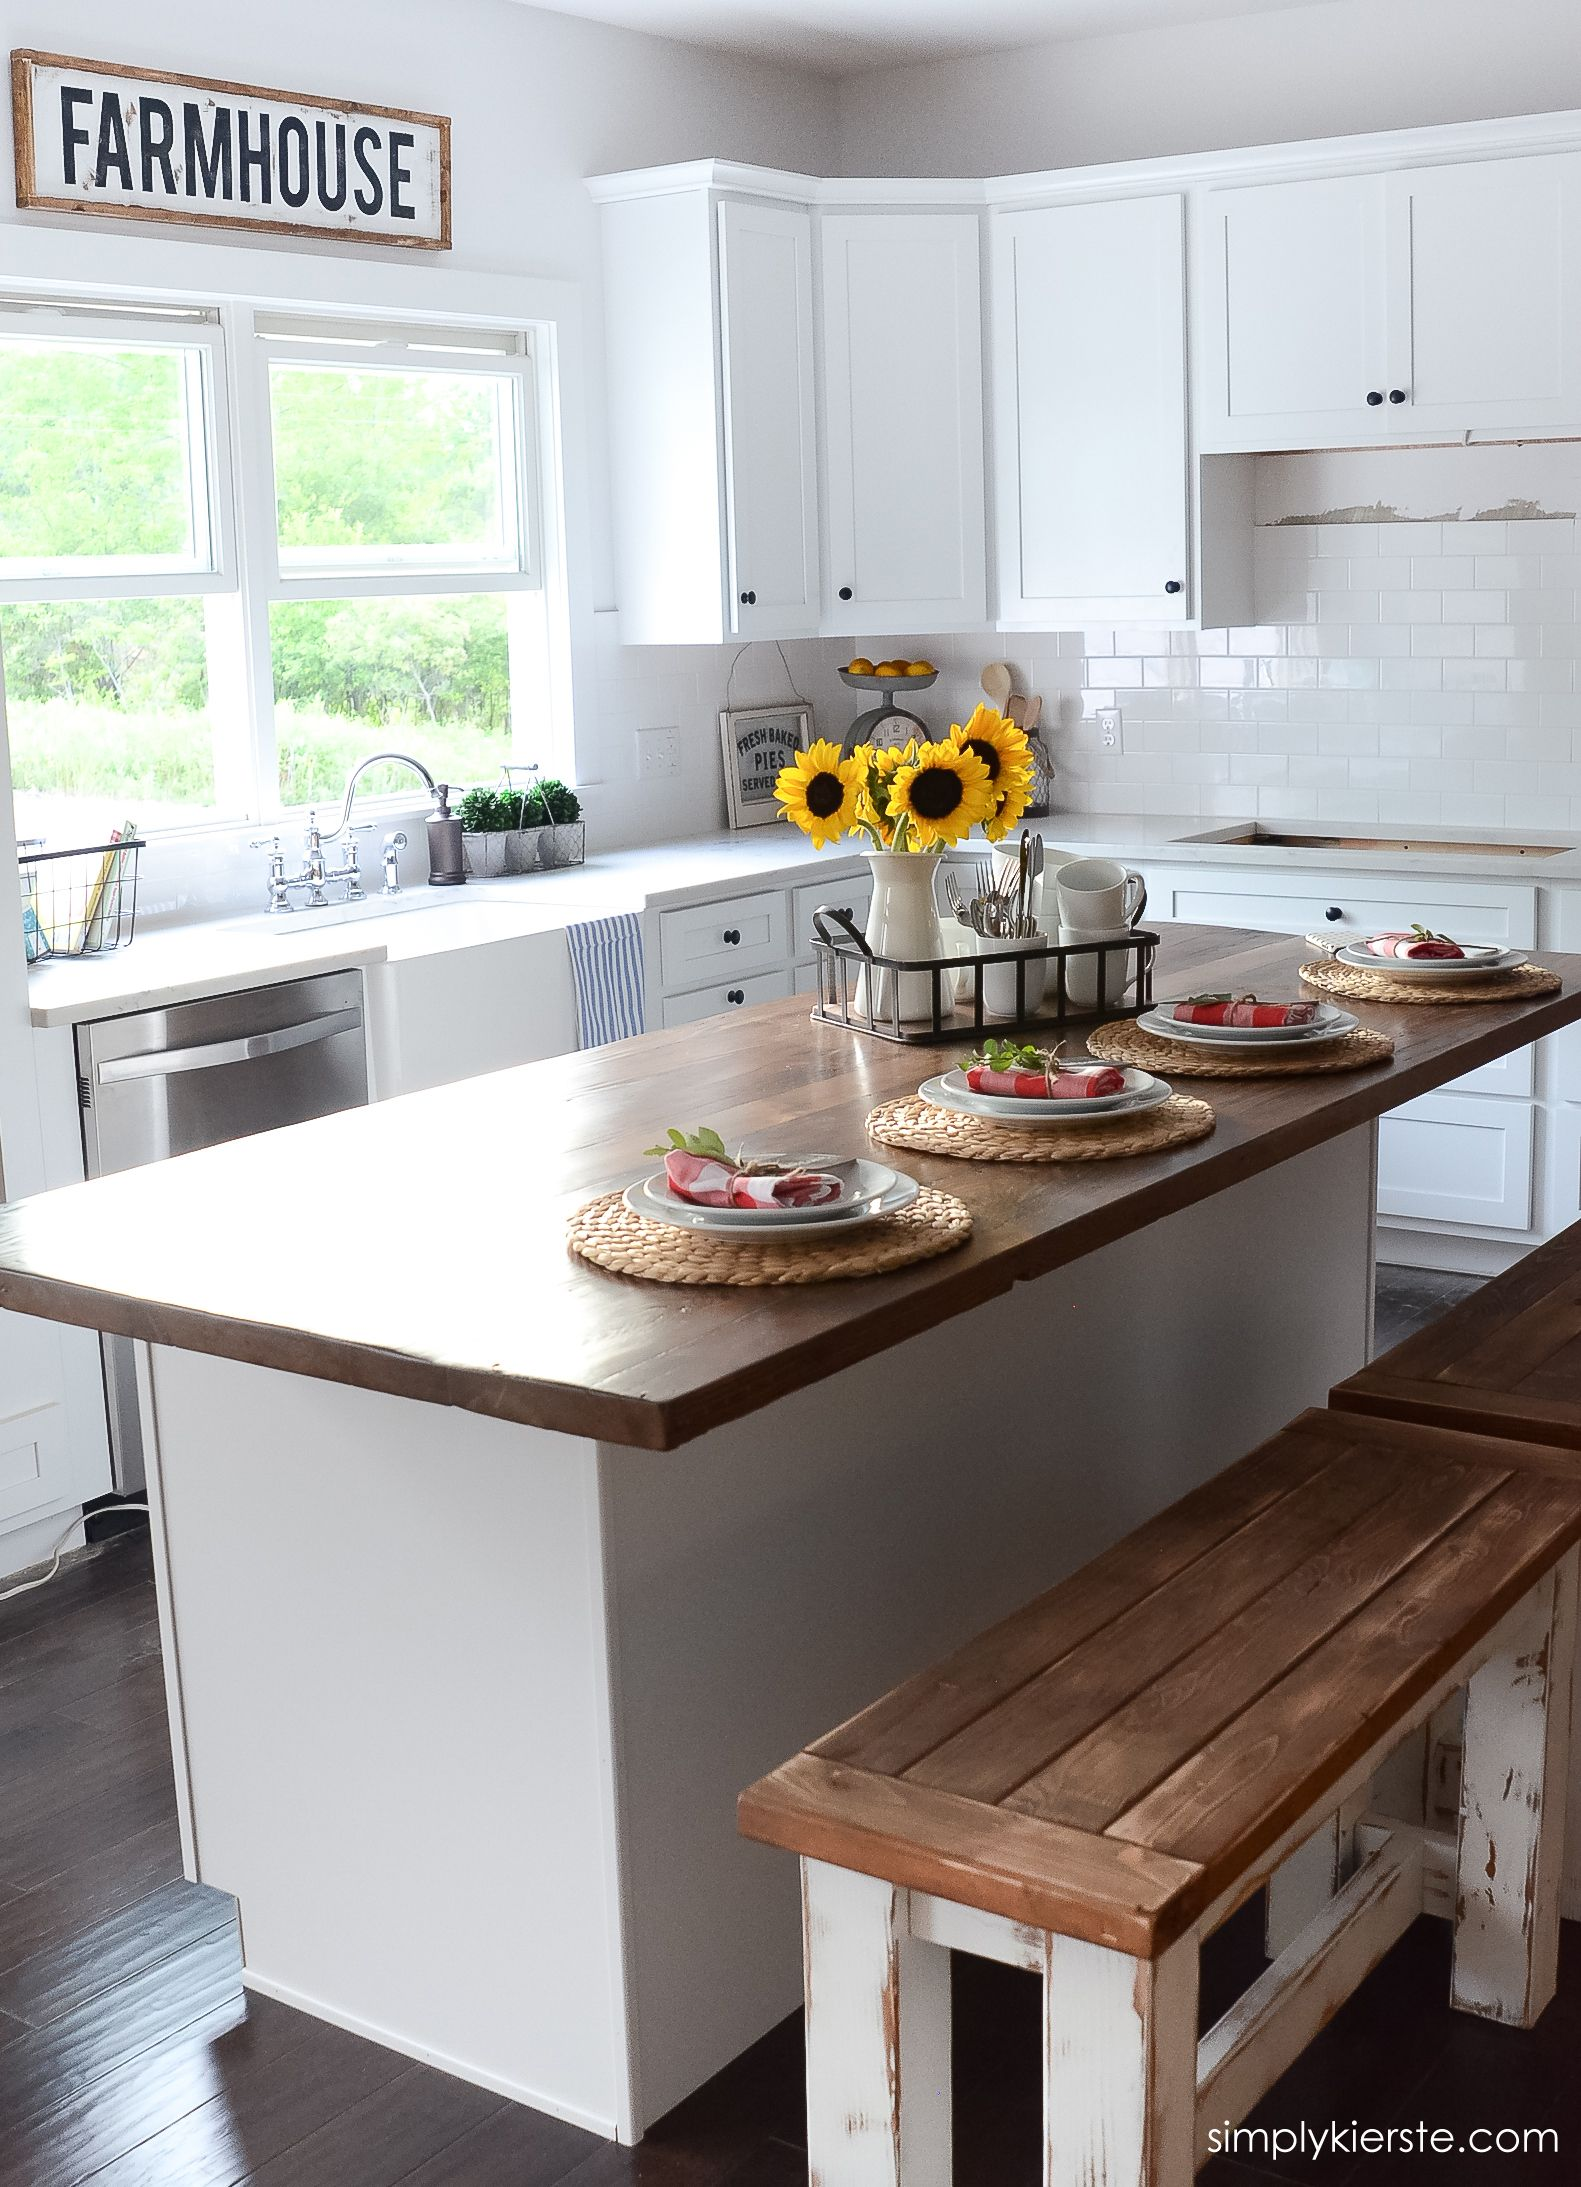 DIY Framed Wood Farmhouse Sign Kitchen island decor